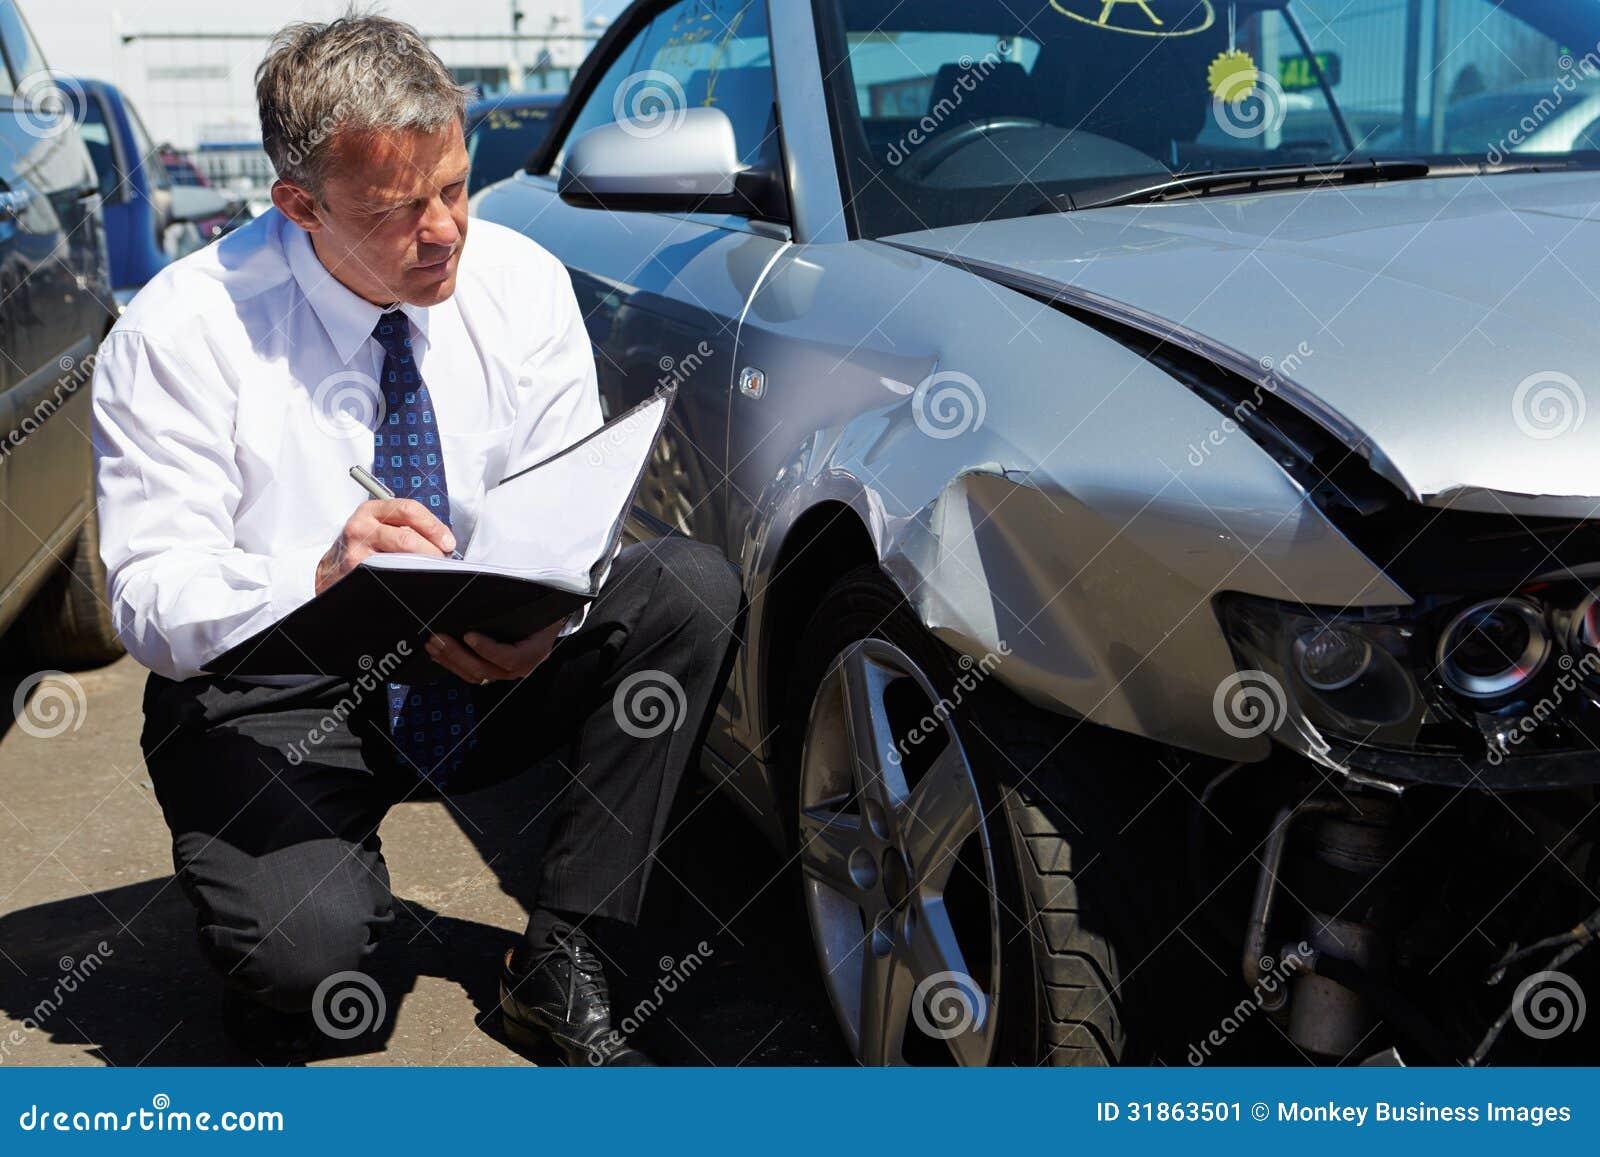 Can You Dispute A Car Insurance Claim